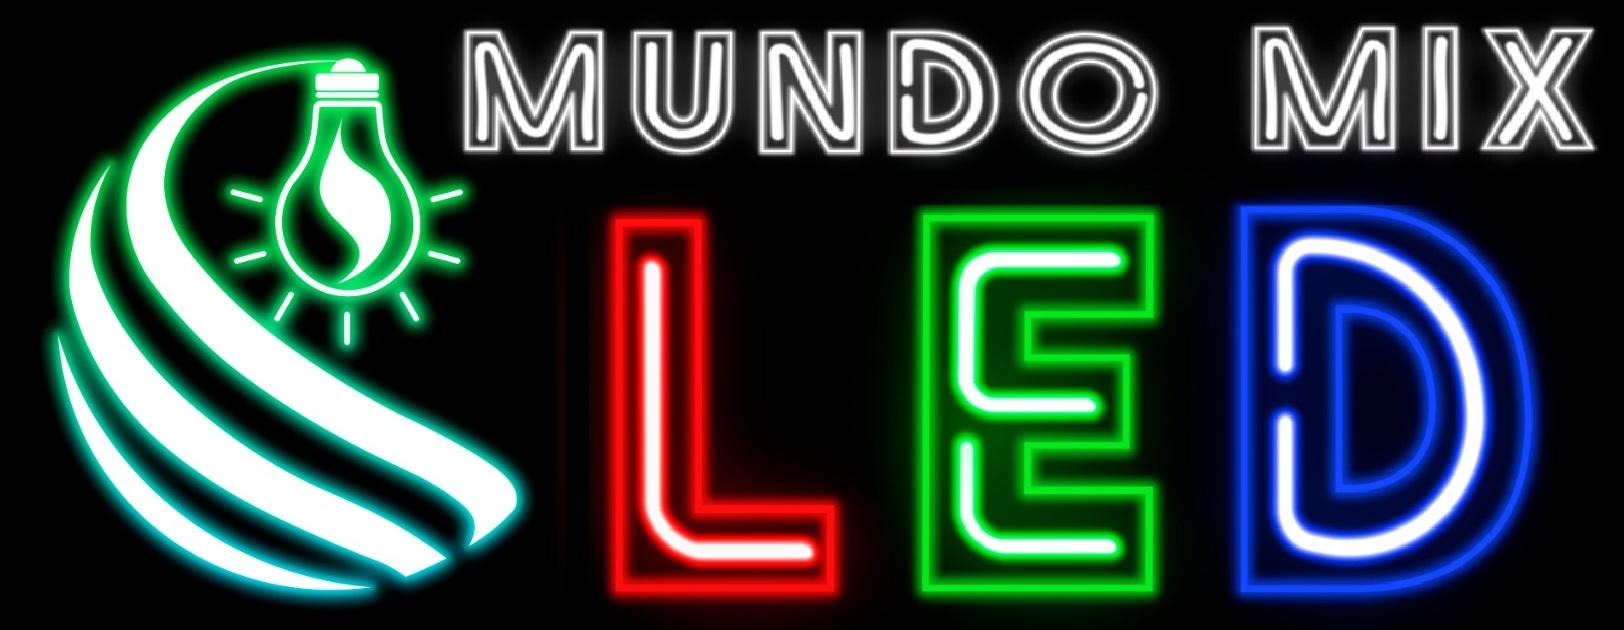 MUNDO MIX LED LTDA - ME